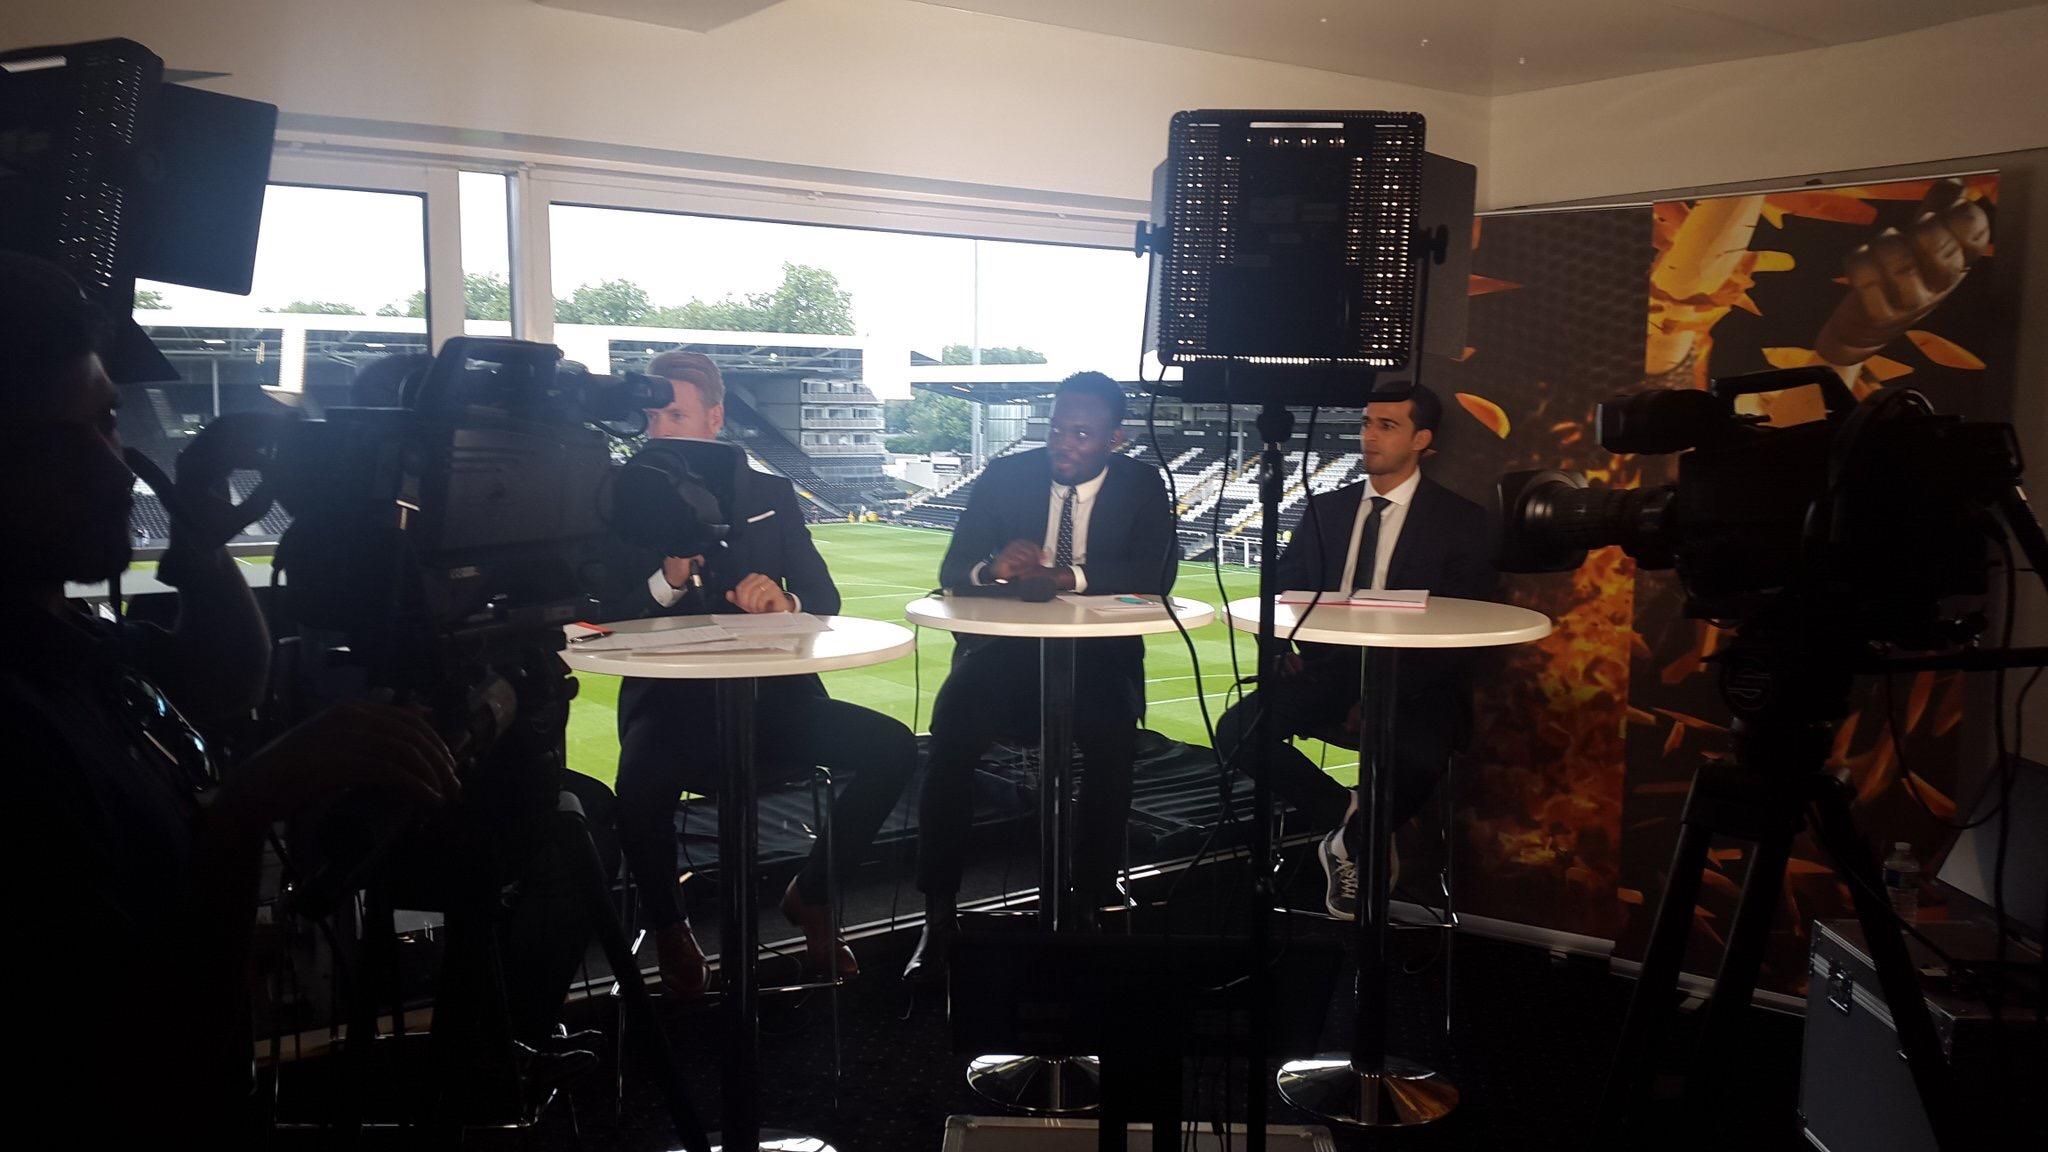 Michael Essien begins punditry work with Saudi-based MBC Sports in London